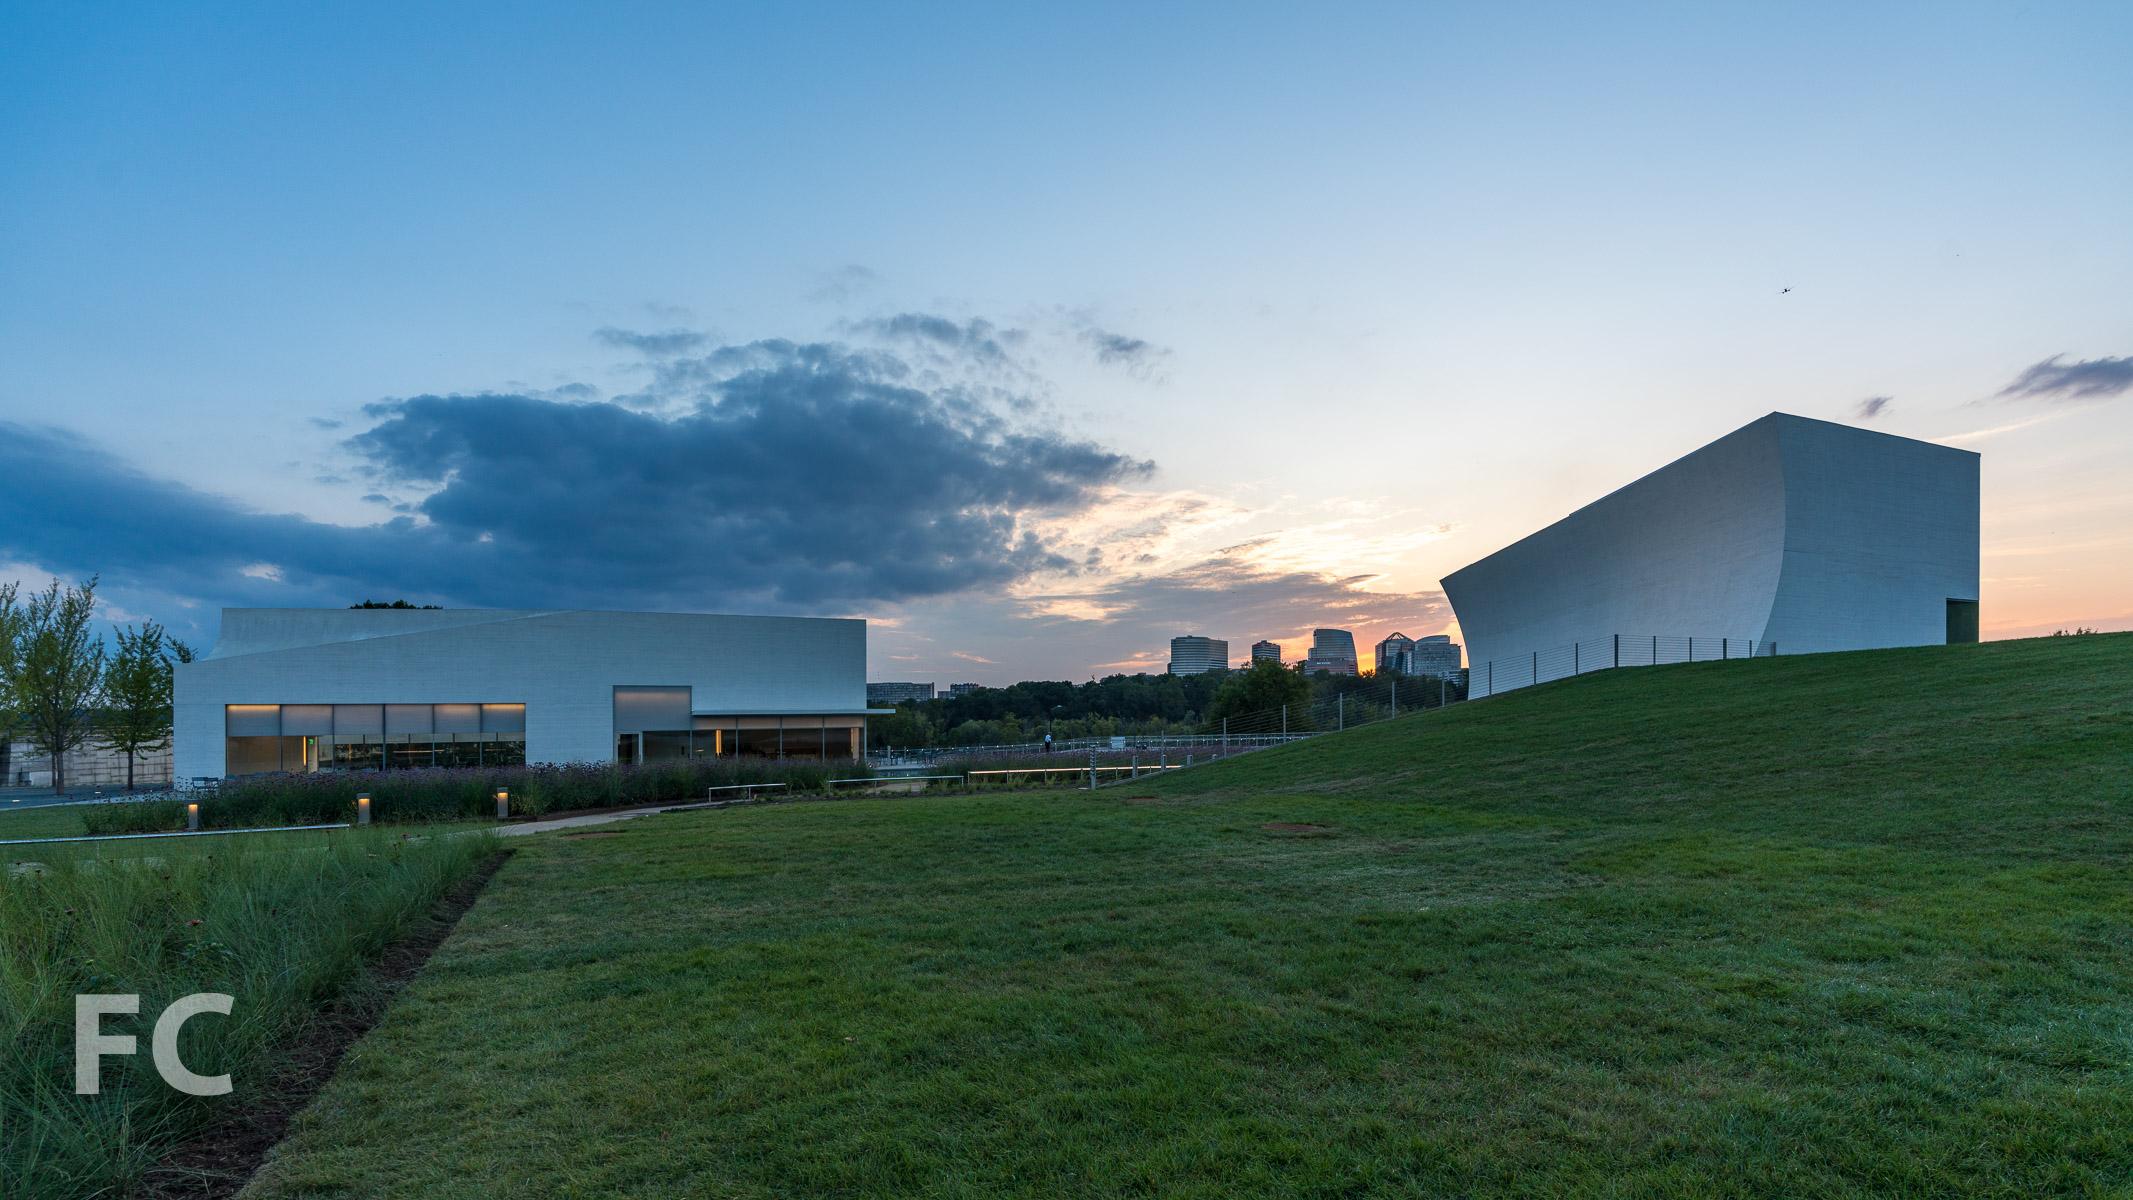 20190831-The Reach at Kennedy Center-DSC06358.jpg